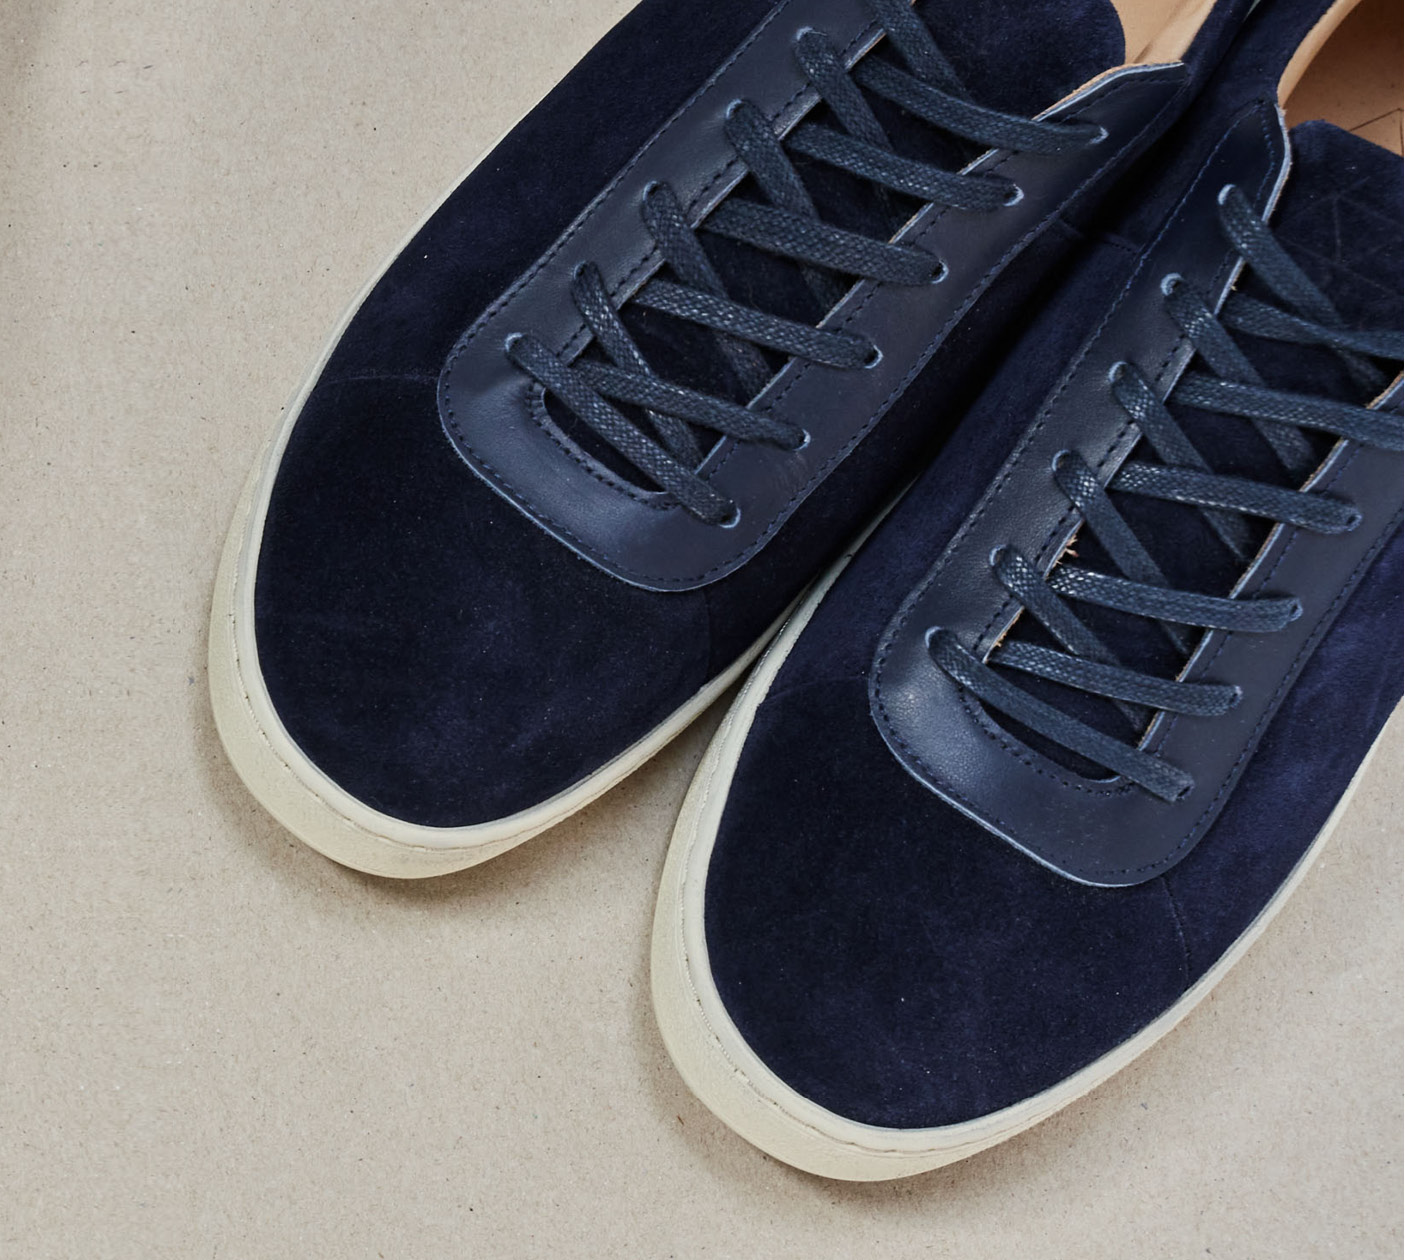 New Season - MULO AW21 - Navy Suede Sneakers